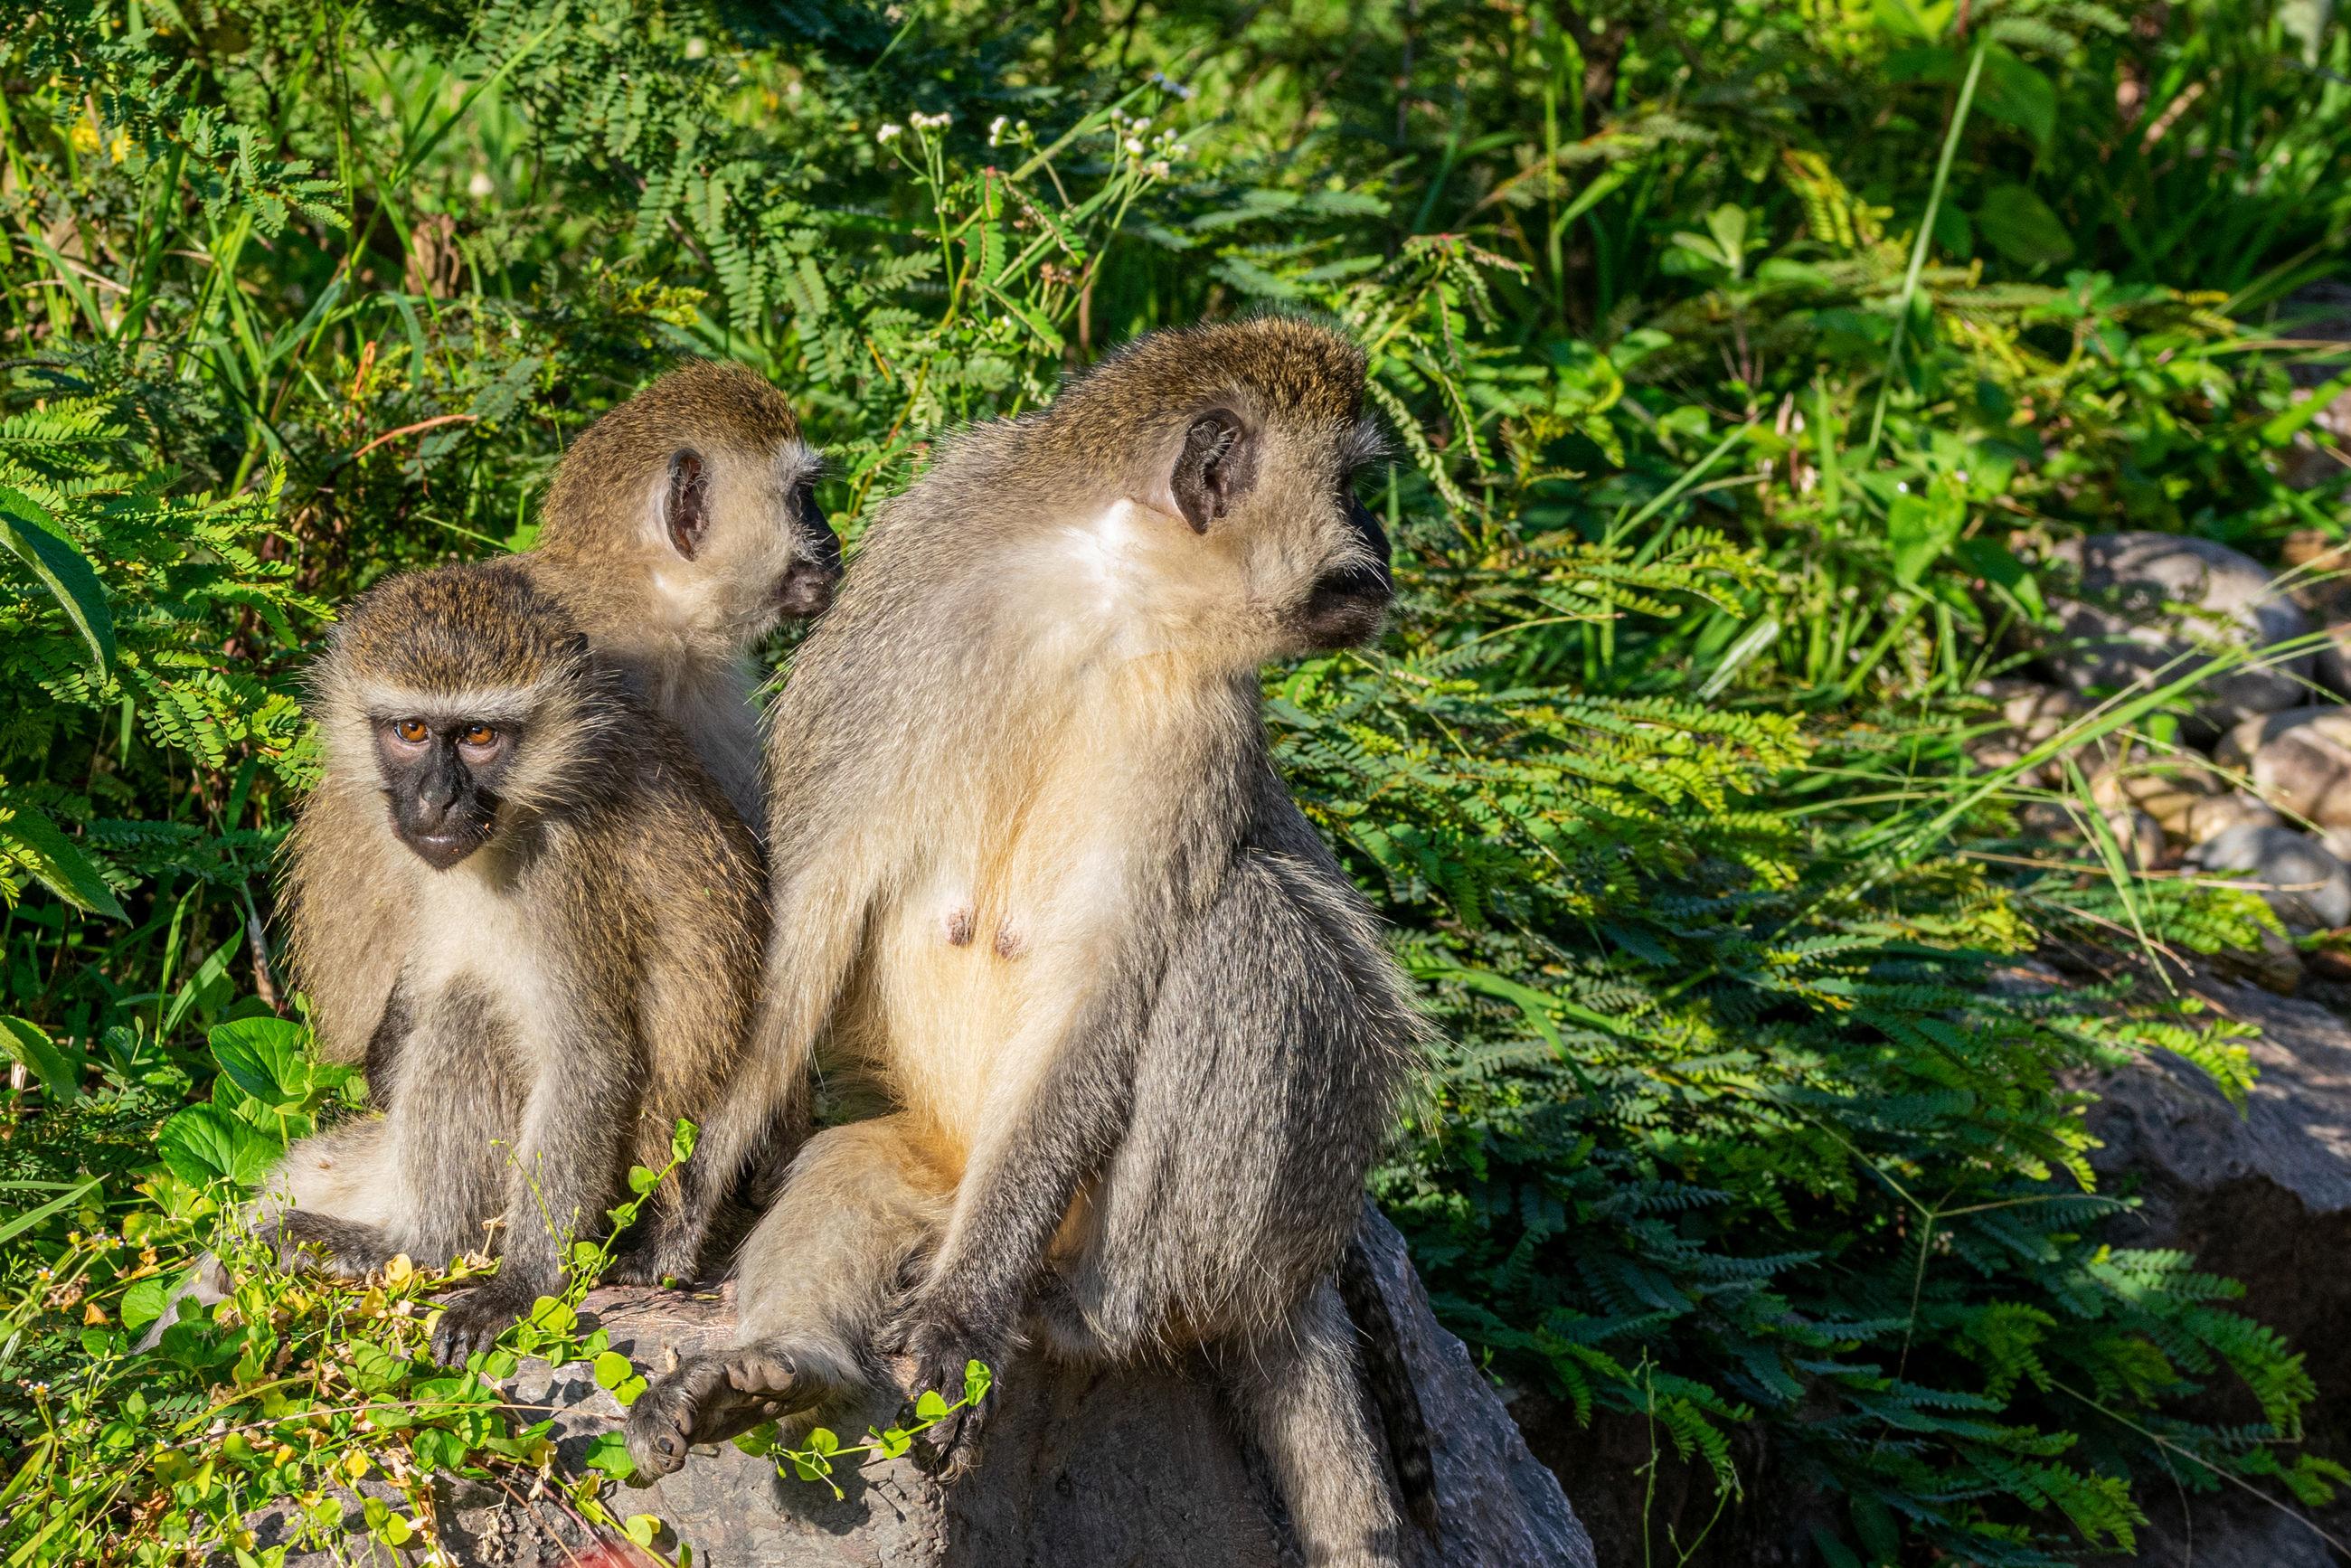 Monkeys sitting in a forest